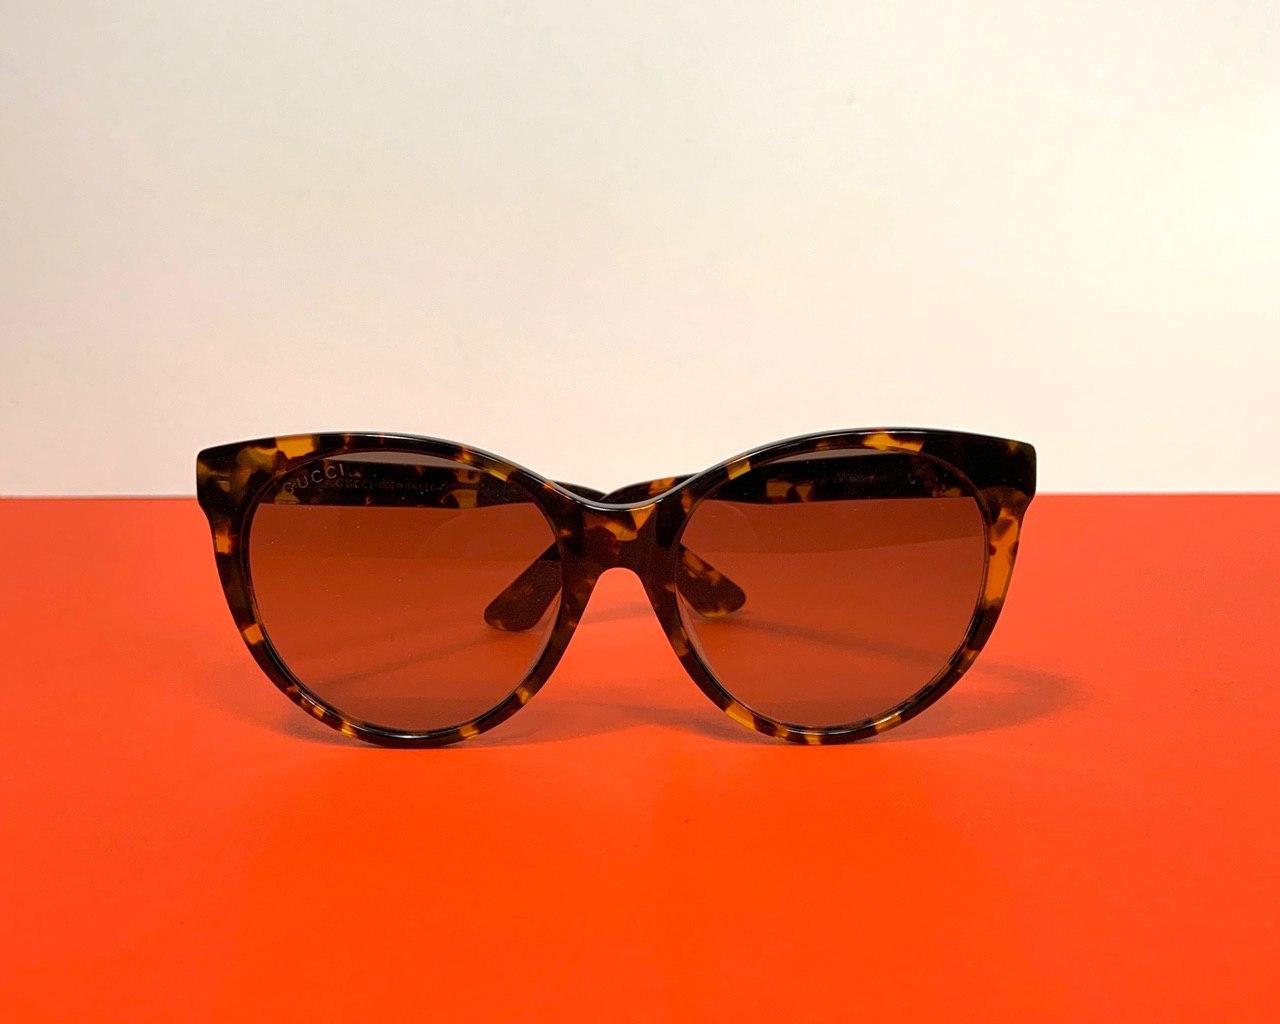 Женские очки Gucci (Гуччи) арт. 106-19